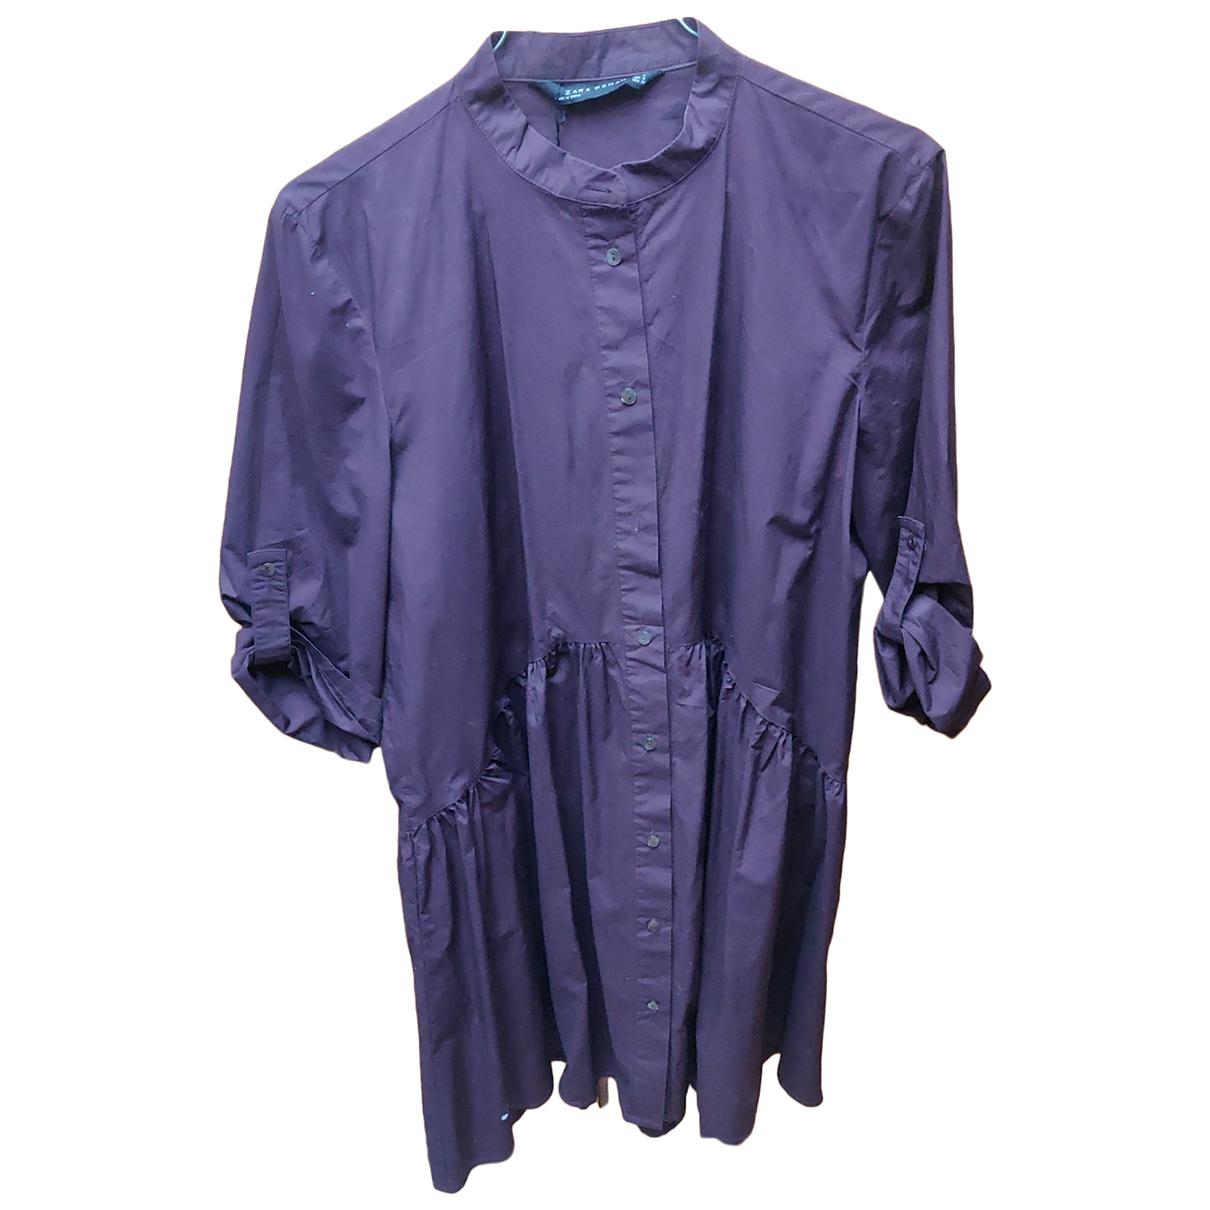 Zara \N Kleid in  Lila Baumwolle